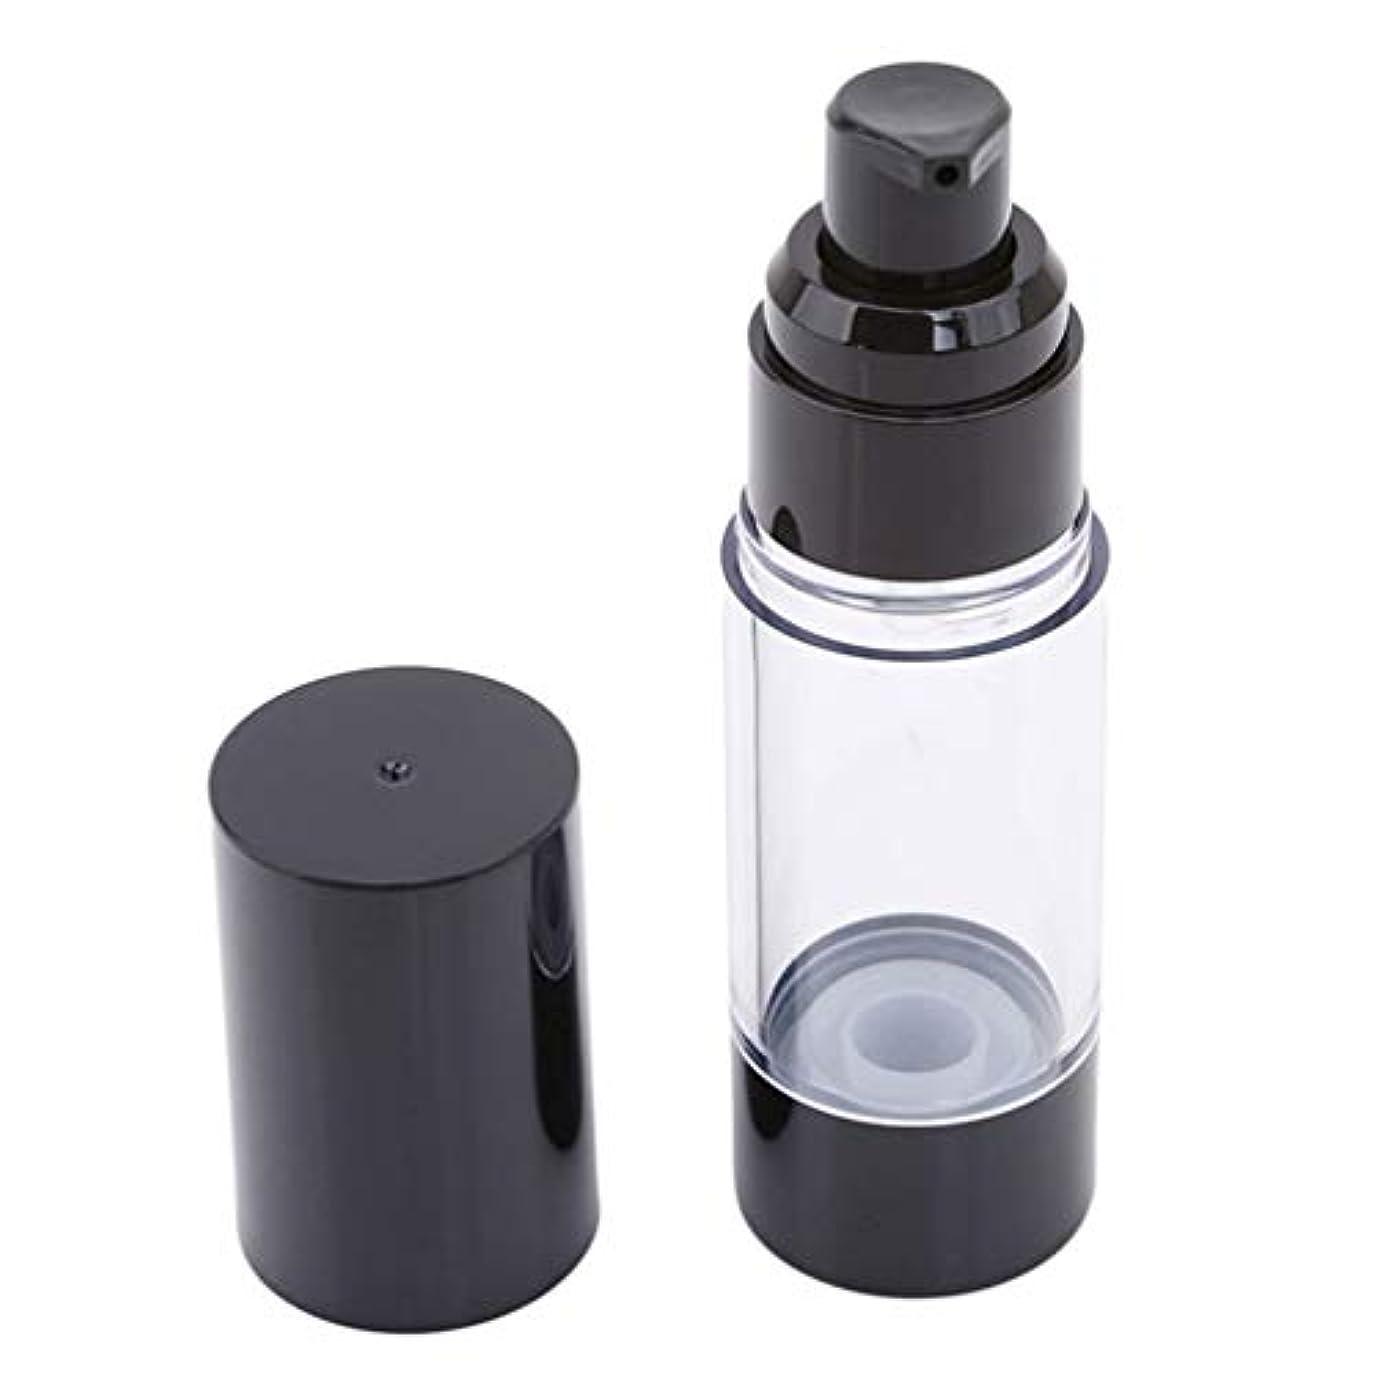 LJSLYJ 真空ポンプ化粧品ボトル旅行ポータブルBBクリームファンデーションプレスミニエマルジョンスプレー空のボトル、30ミリリットル